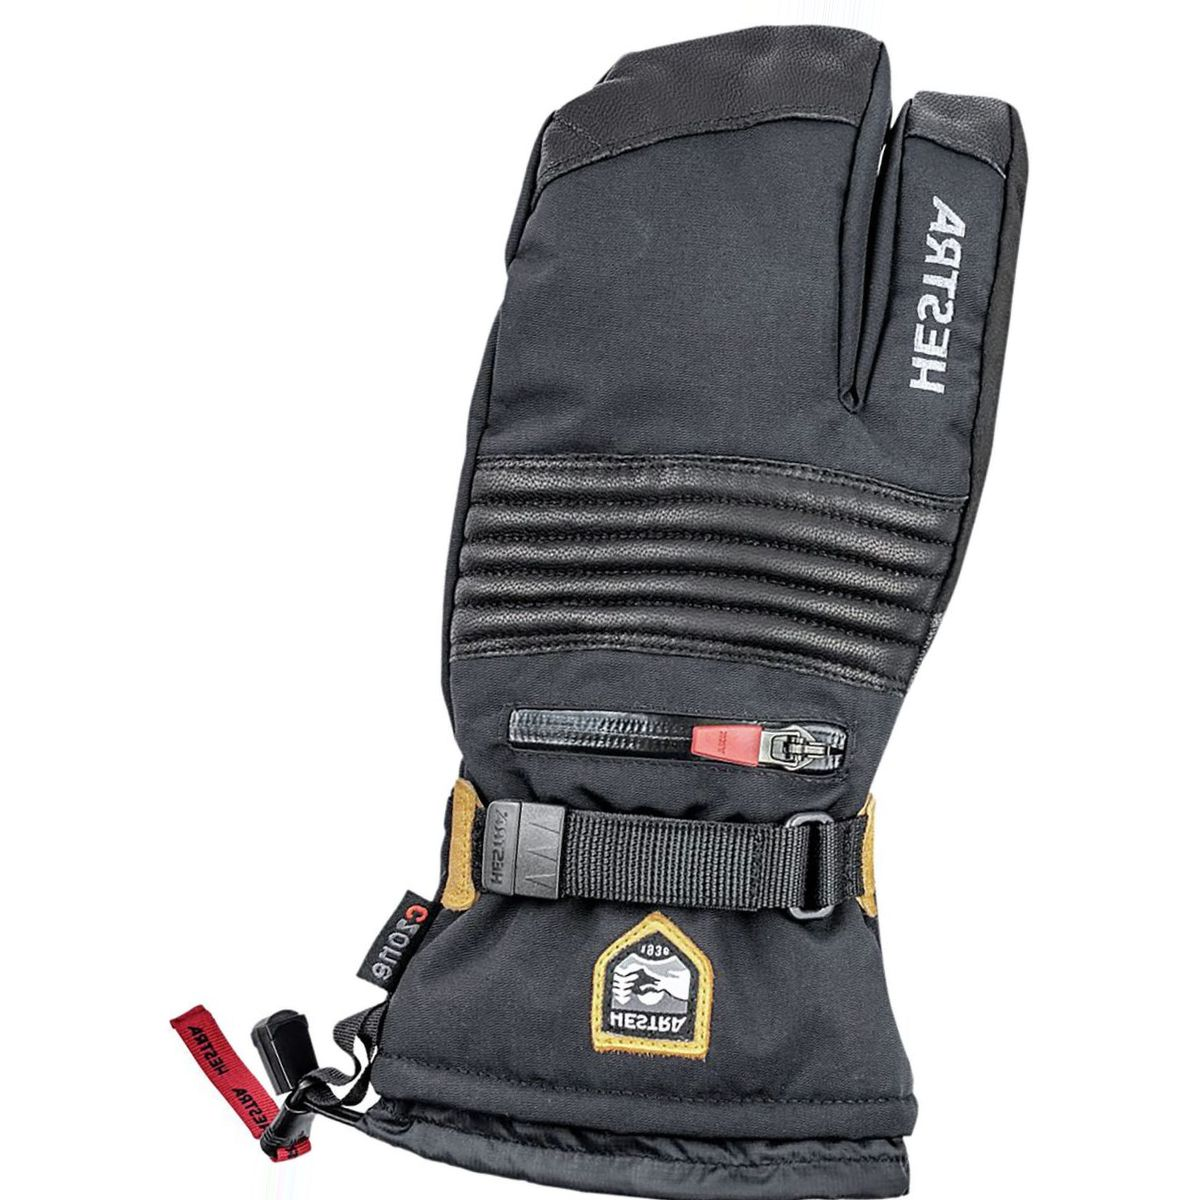 Hestra All Mountain CZone 3-Finger Glove - Men's